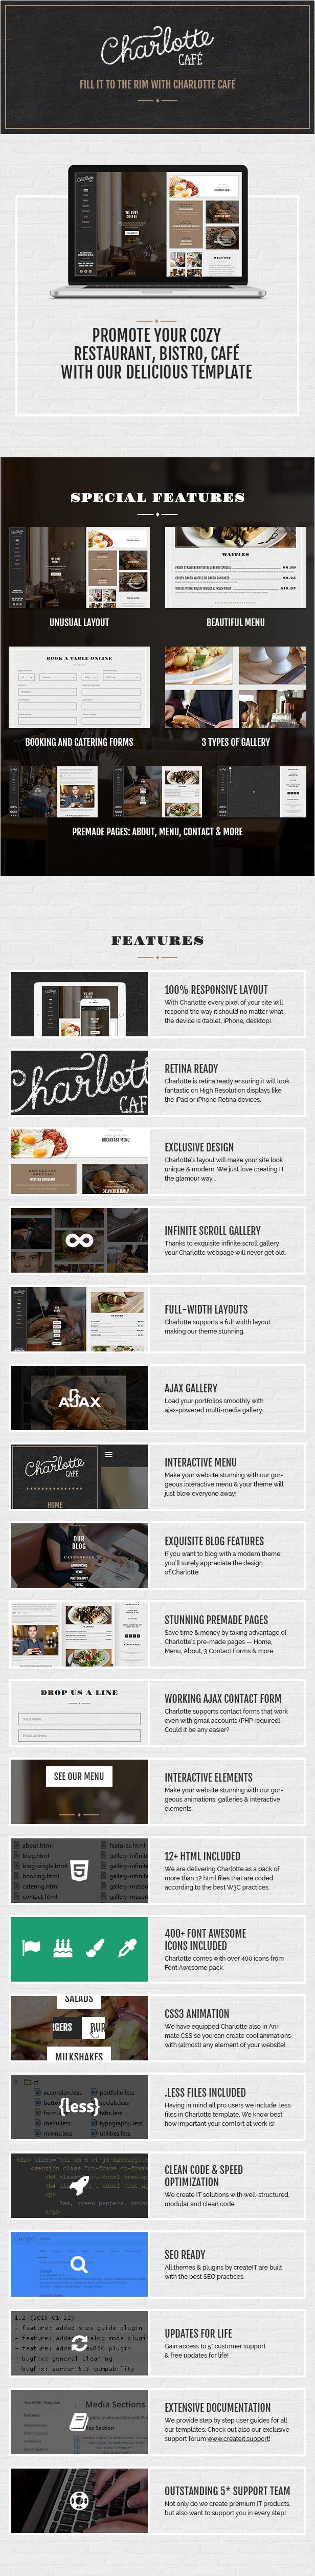 Charlotte - Café Bistro HTML Template - 8